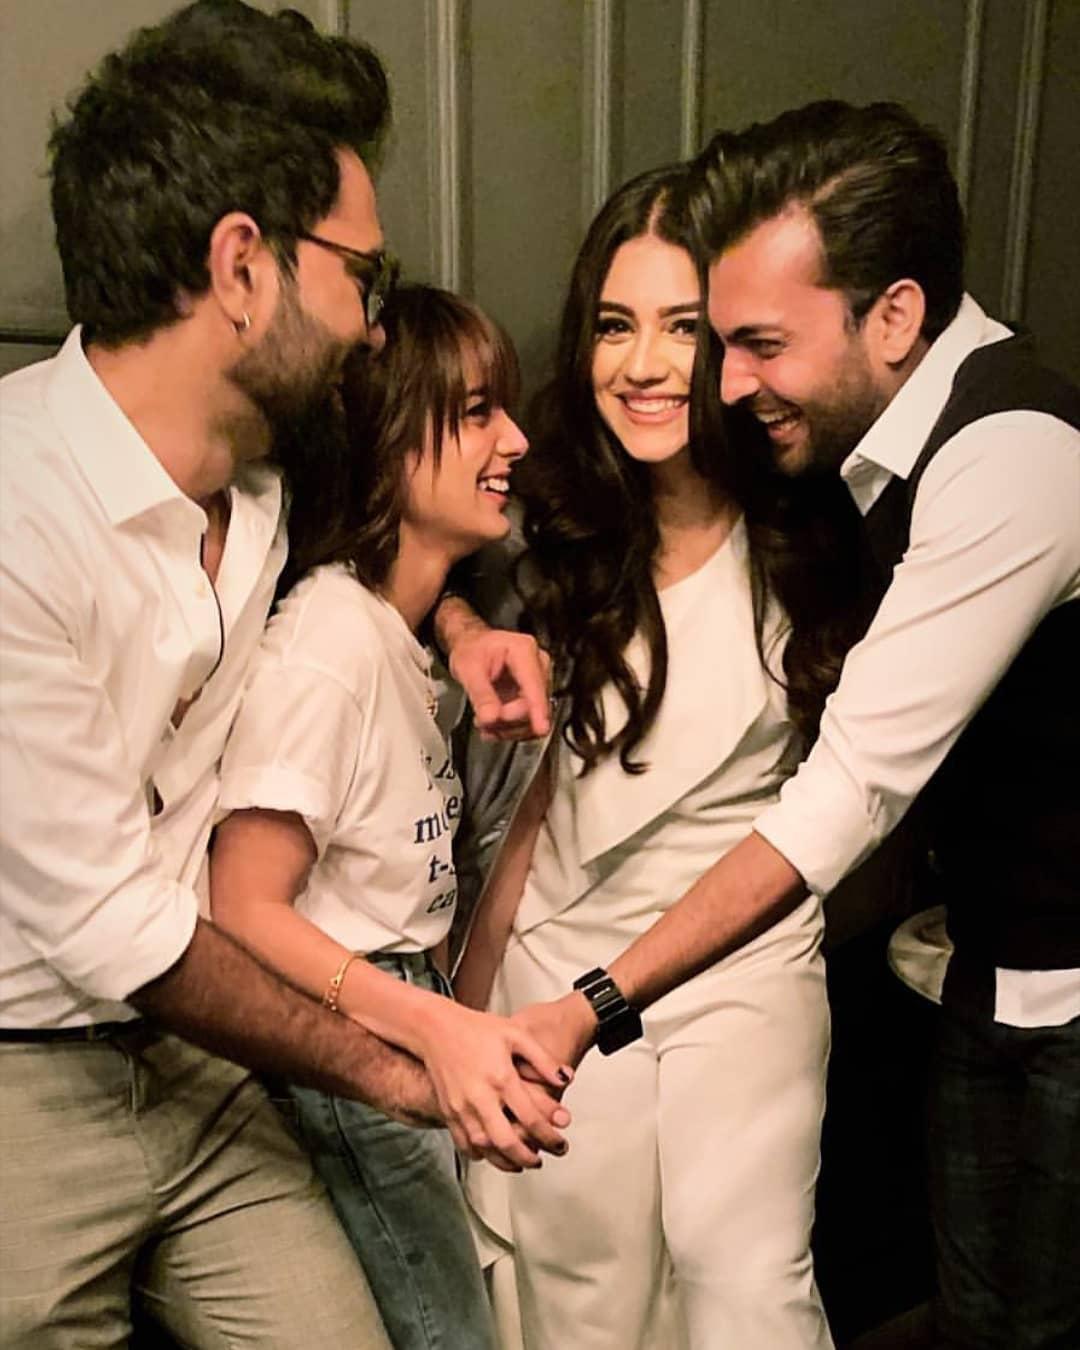 1st Wedding Annivarsy Party of Zara Noor Abbas and Asad Siddique - Huge Celebrities Gathering